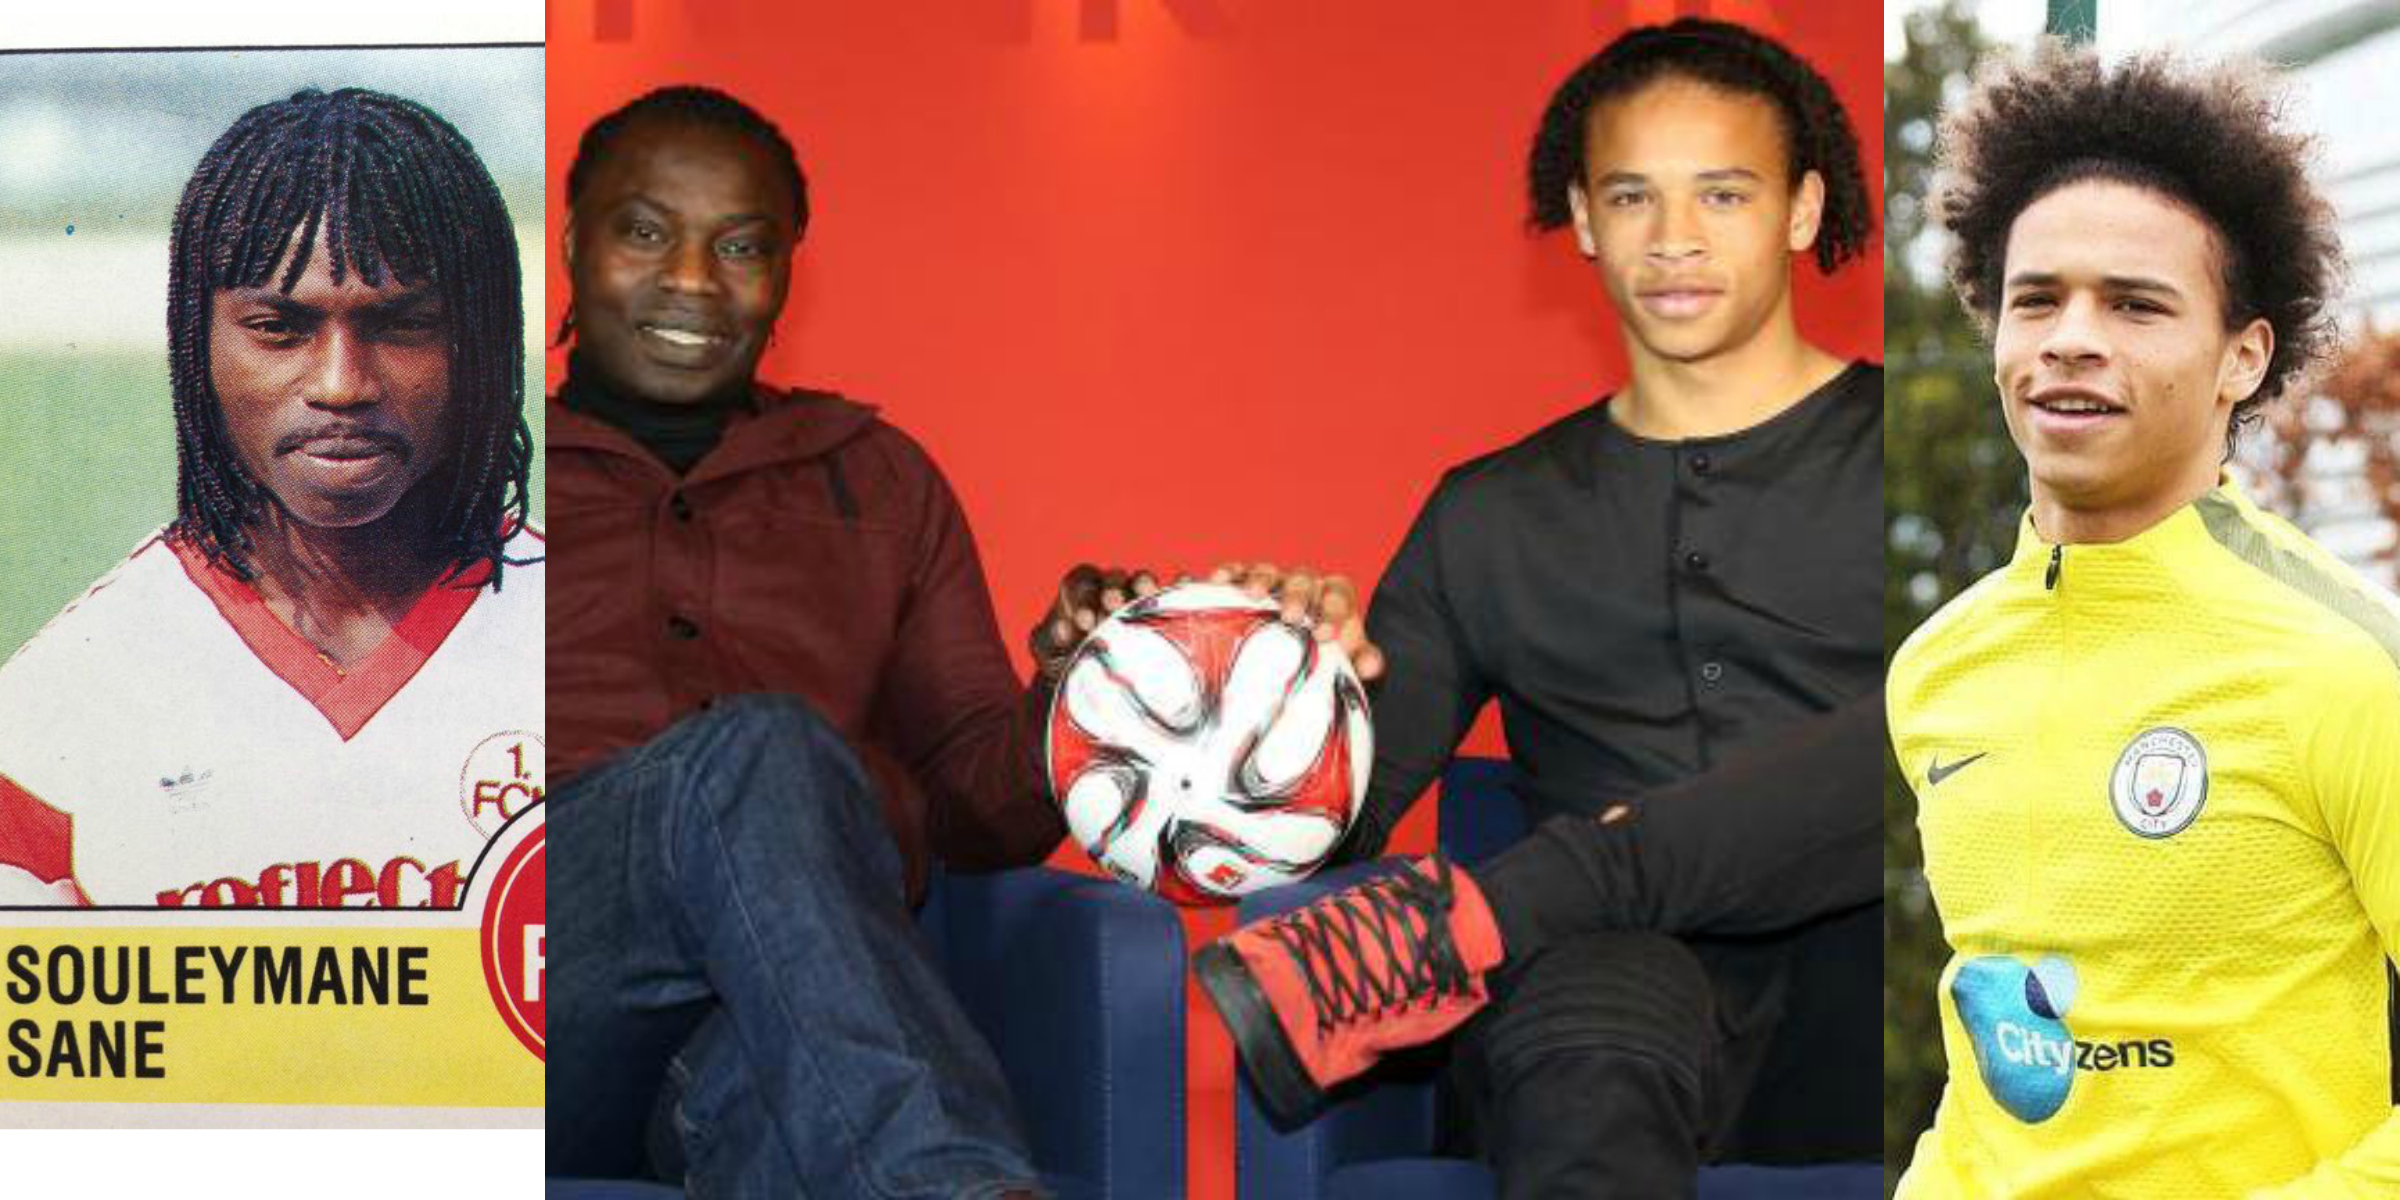 Souleymane Sane and Leroy Sane